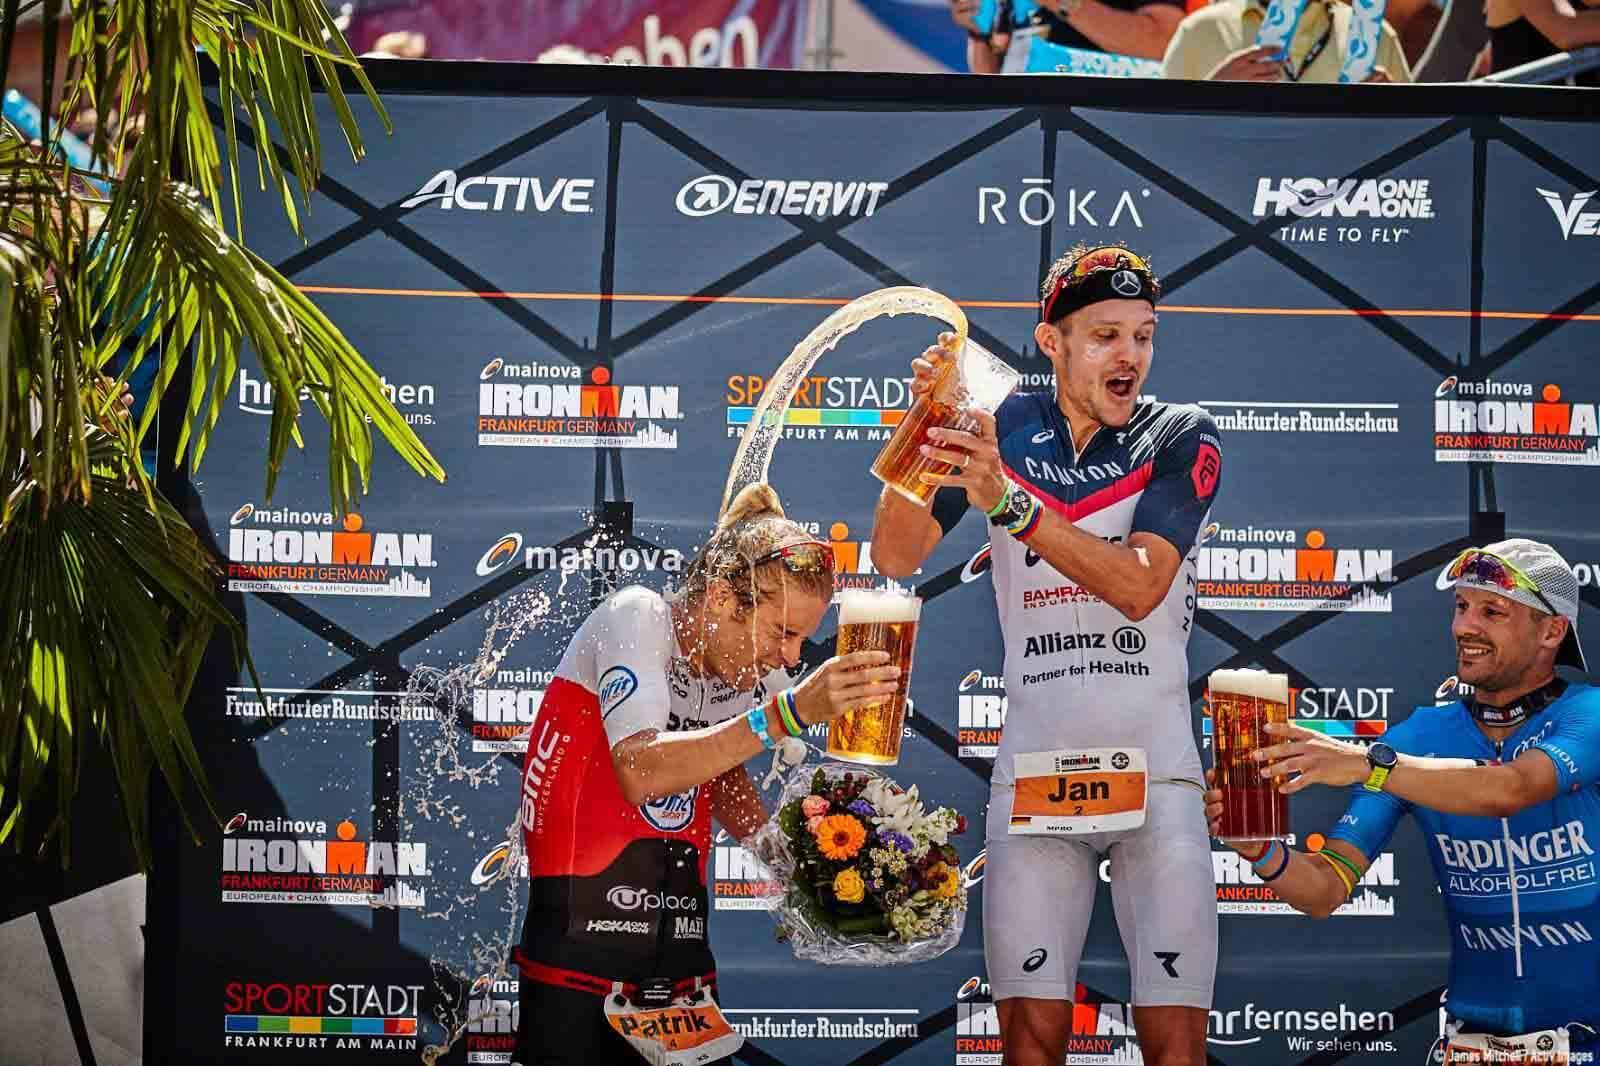 HOKA athlete Patrik Nilsson on the podium at 2018 IRONMAN Frankfurt.